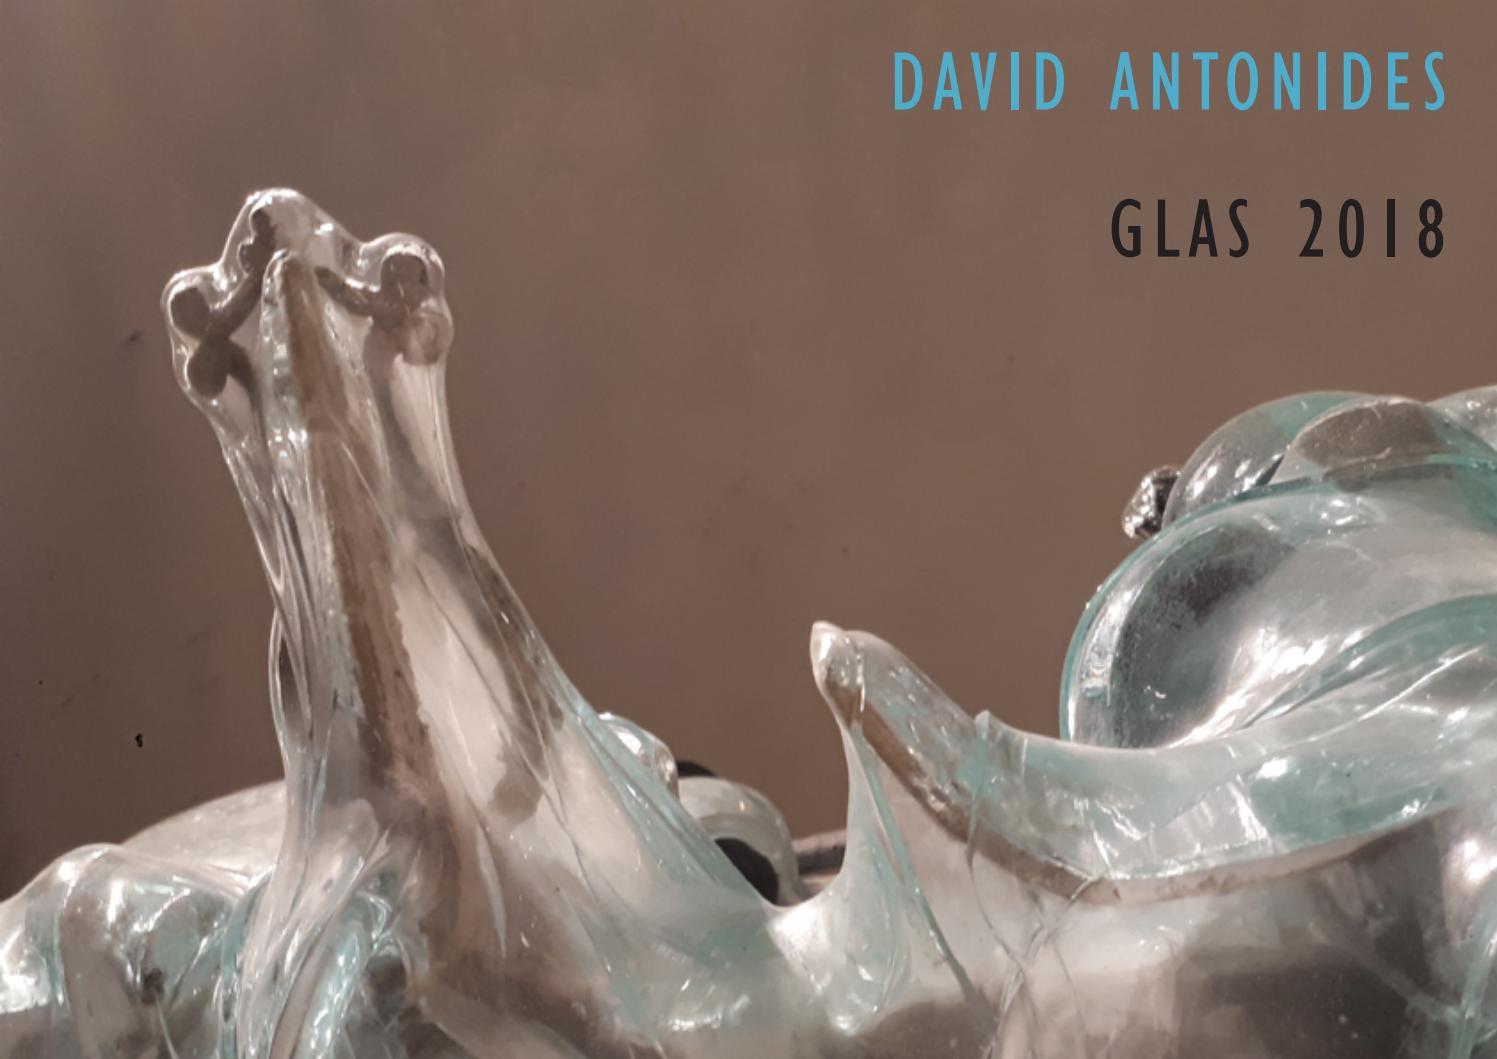 DAVID ANTONIDES GLAS 2018 by David Antonides - issuu